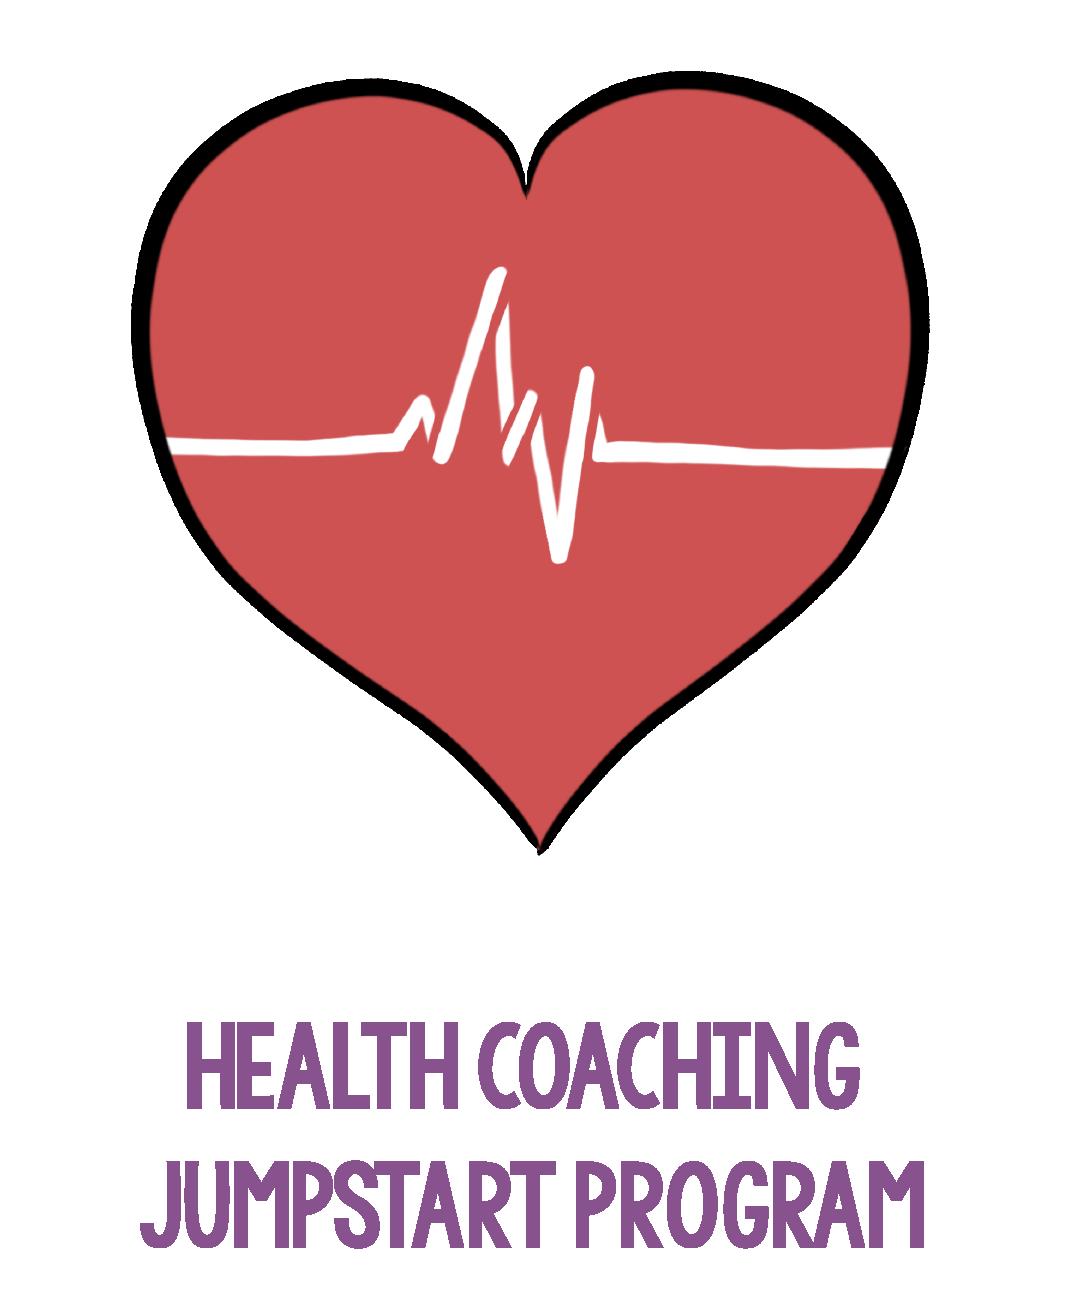 HEALTH COACHING JUMPSTART PROGRAM FOR REAL HEALTHY HABITS